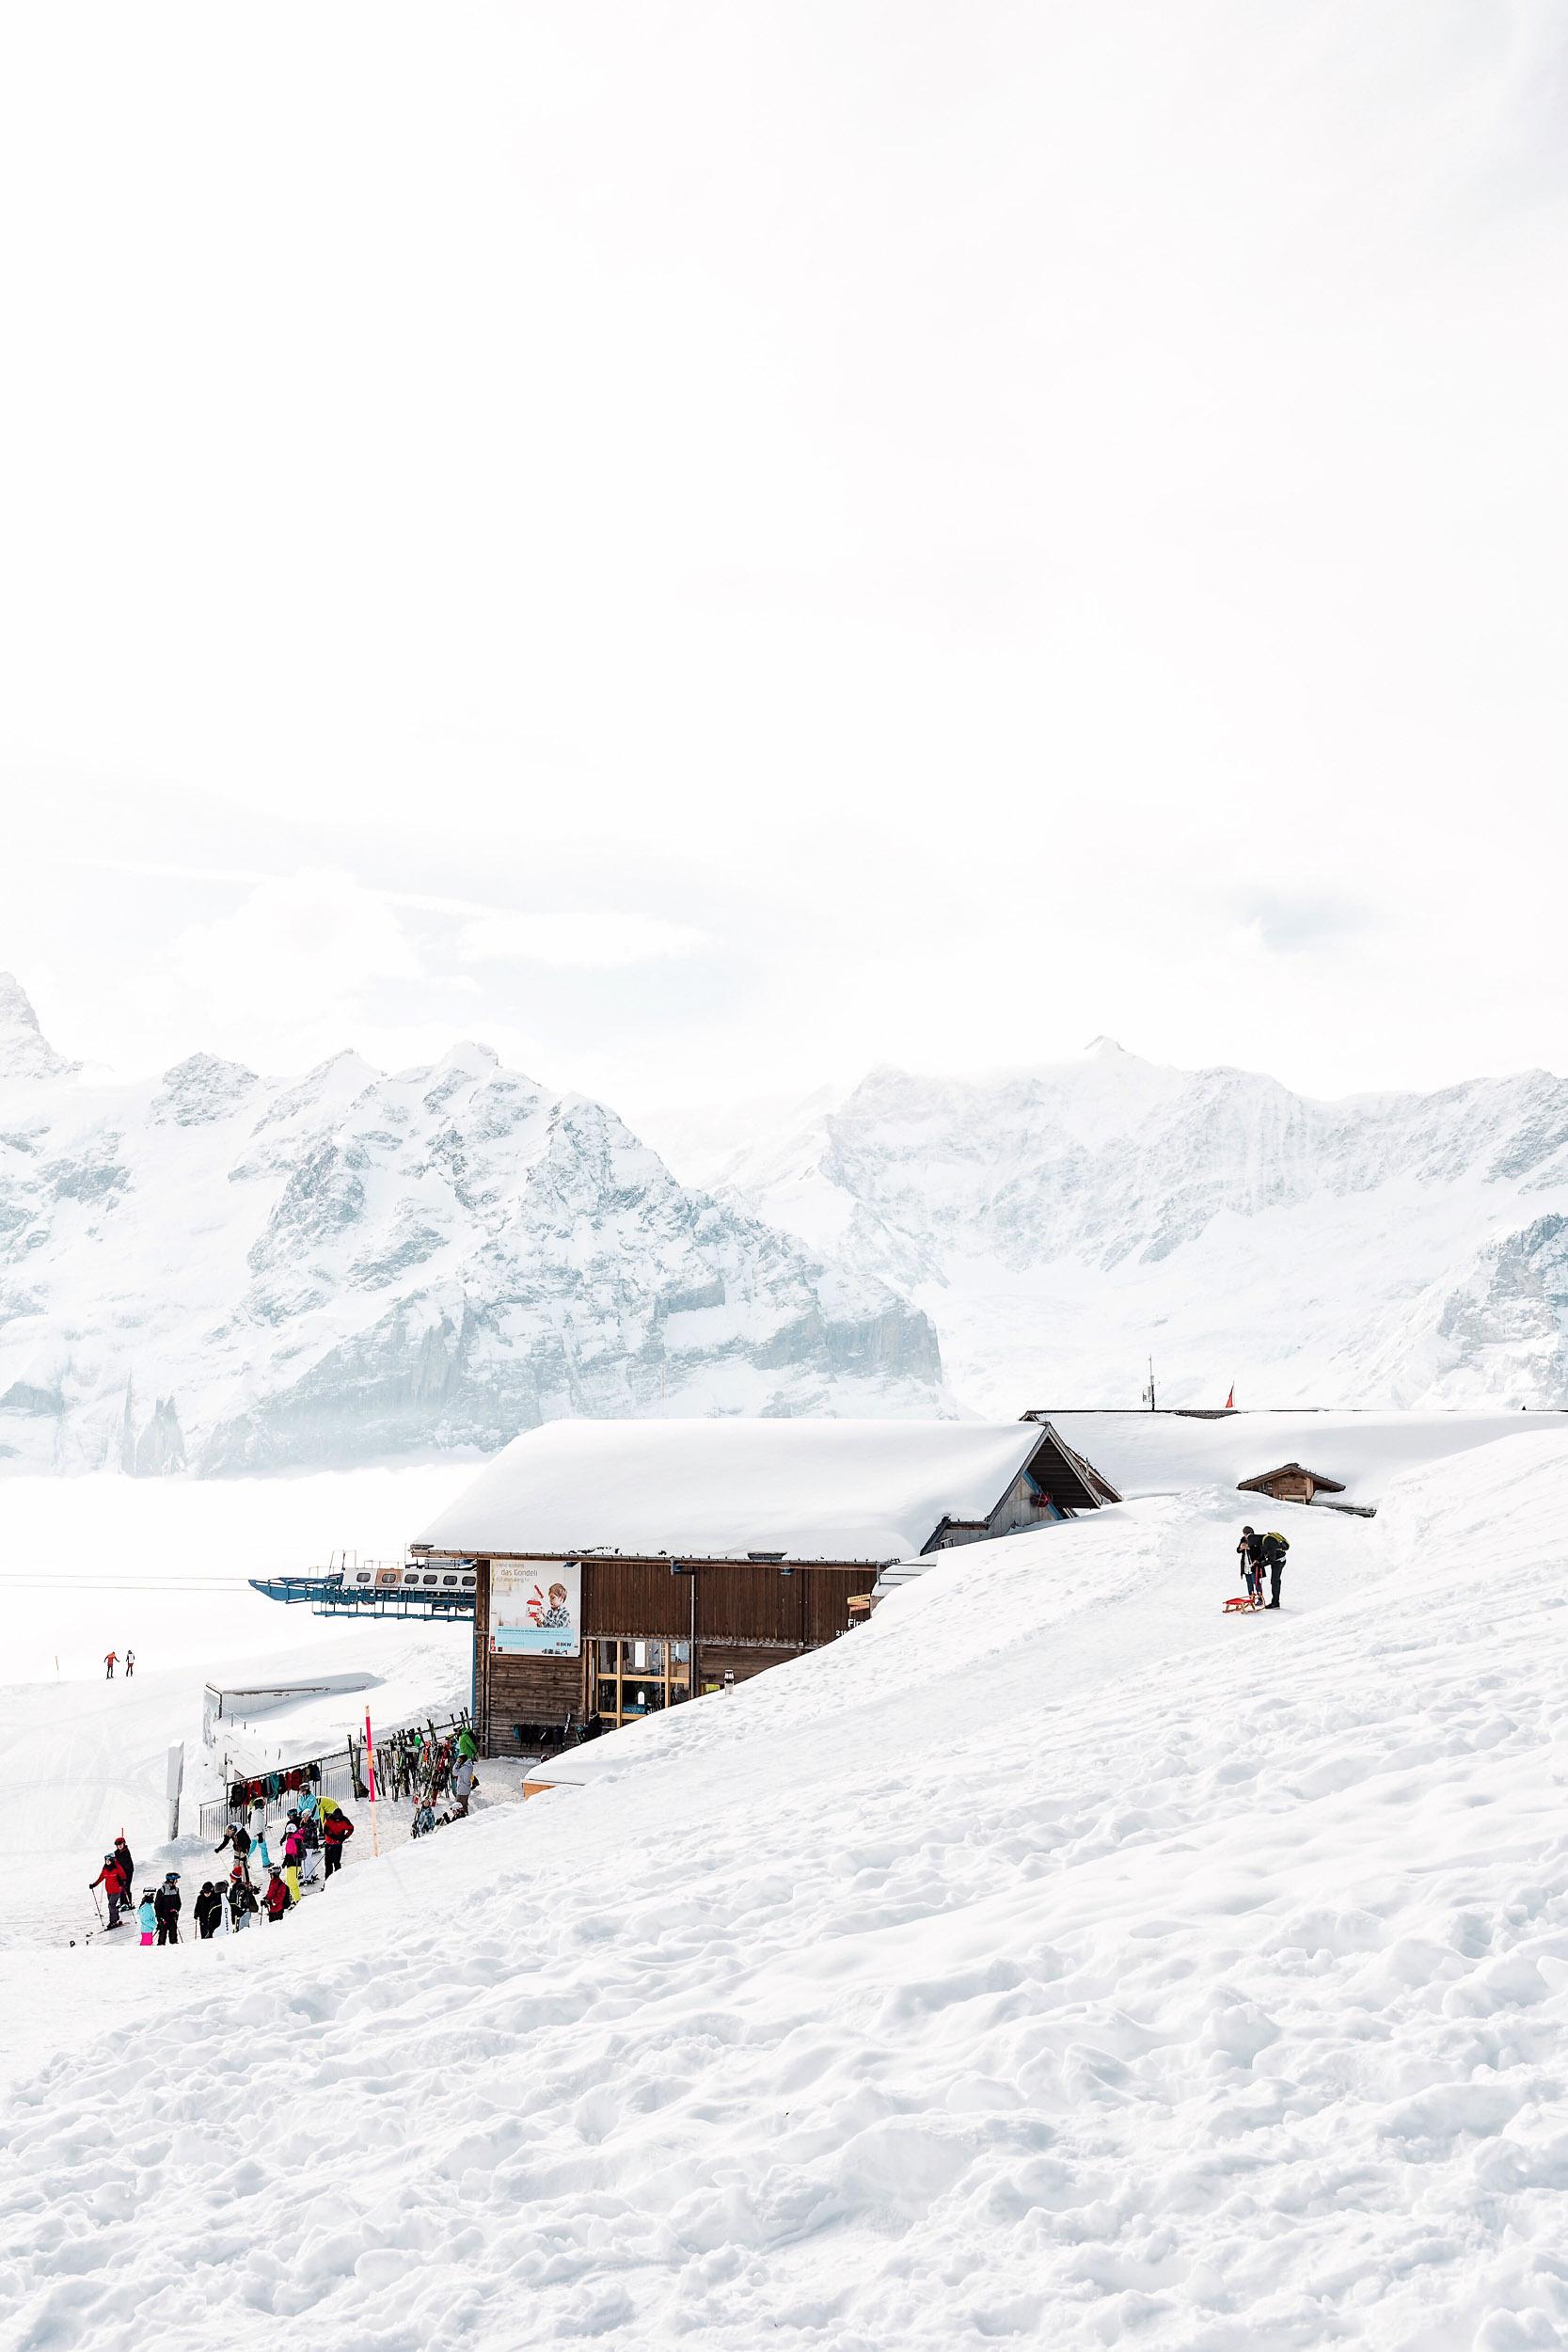 The Grindelwald-First gondola station